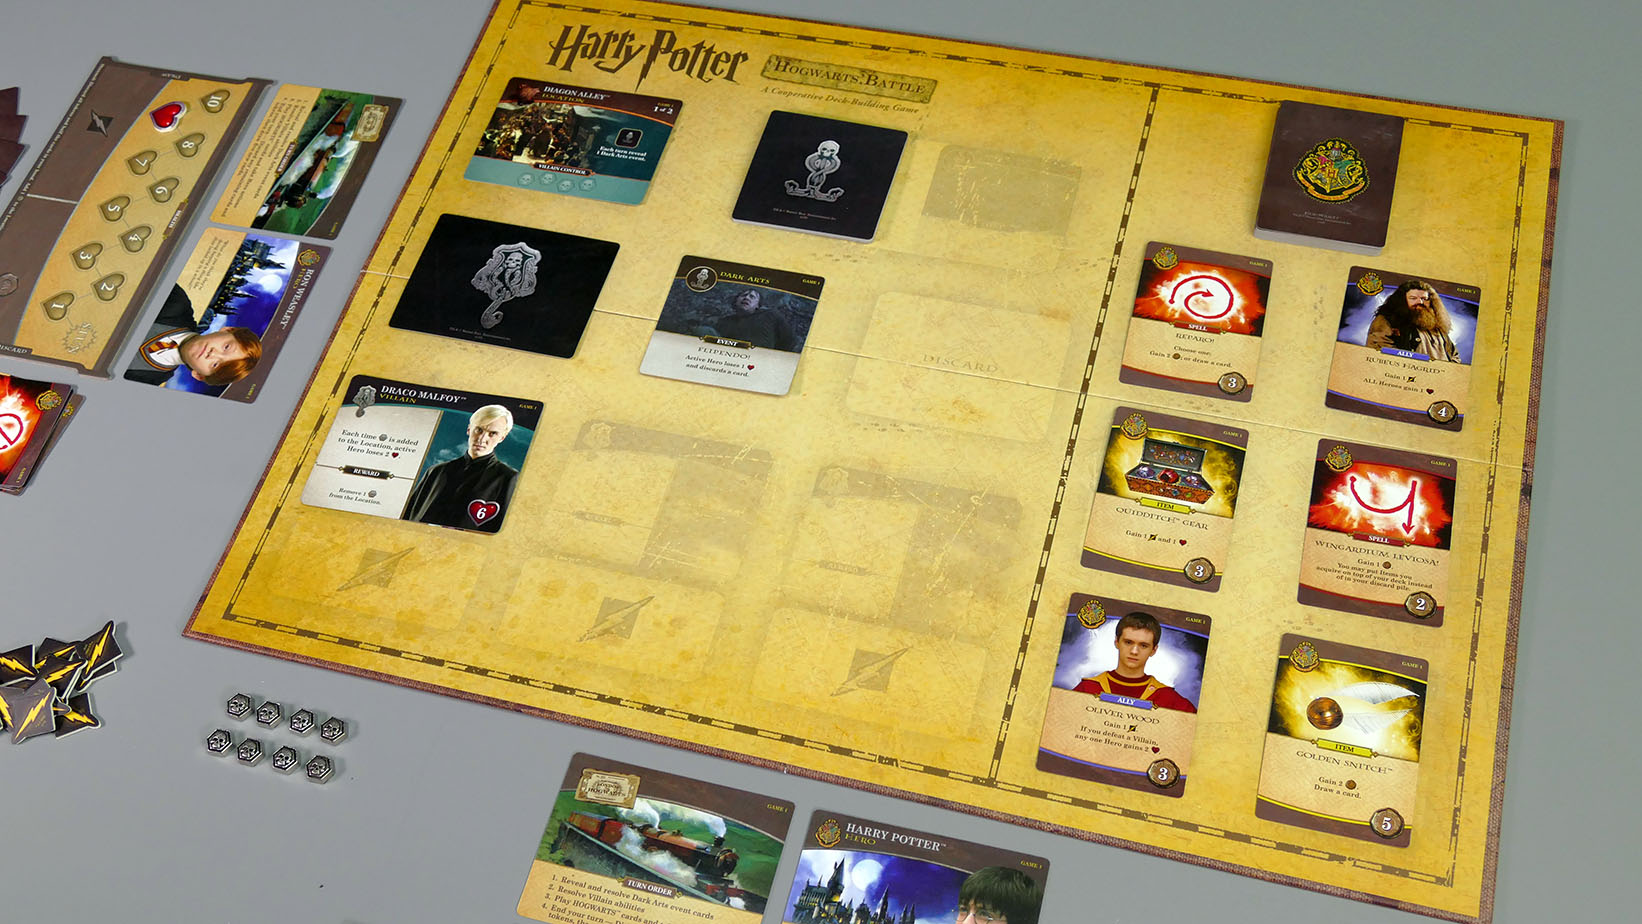 Hogwarts battle Ansicht schräg